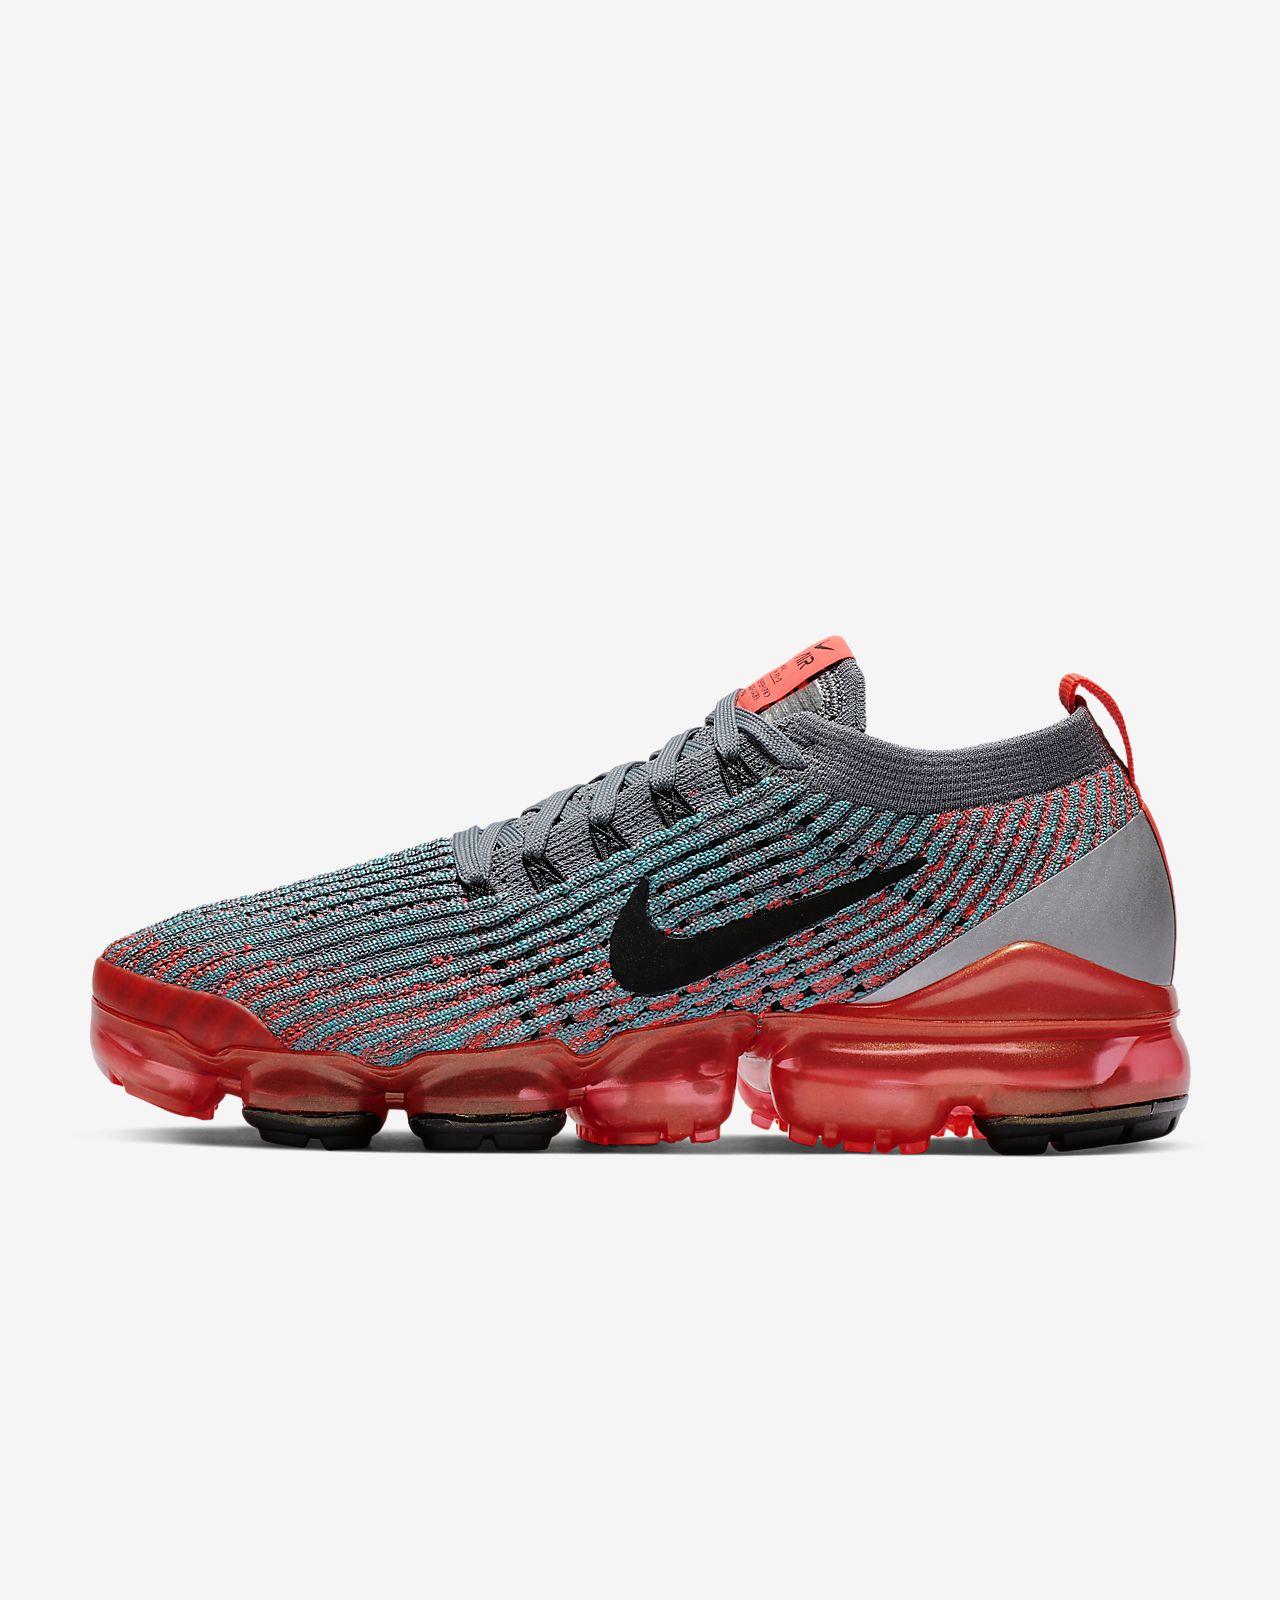 finest selection 8ebaf 6e0a0 ... Nike Air VaporMax Flyknit 3 Zapatillas - Mujer